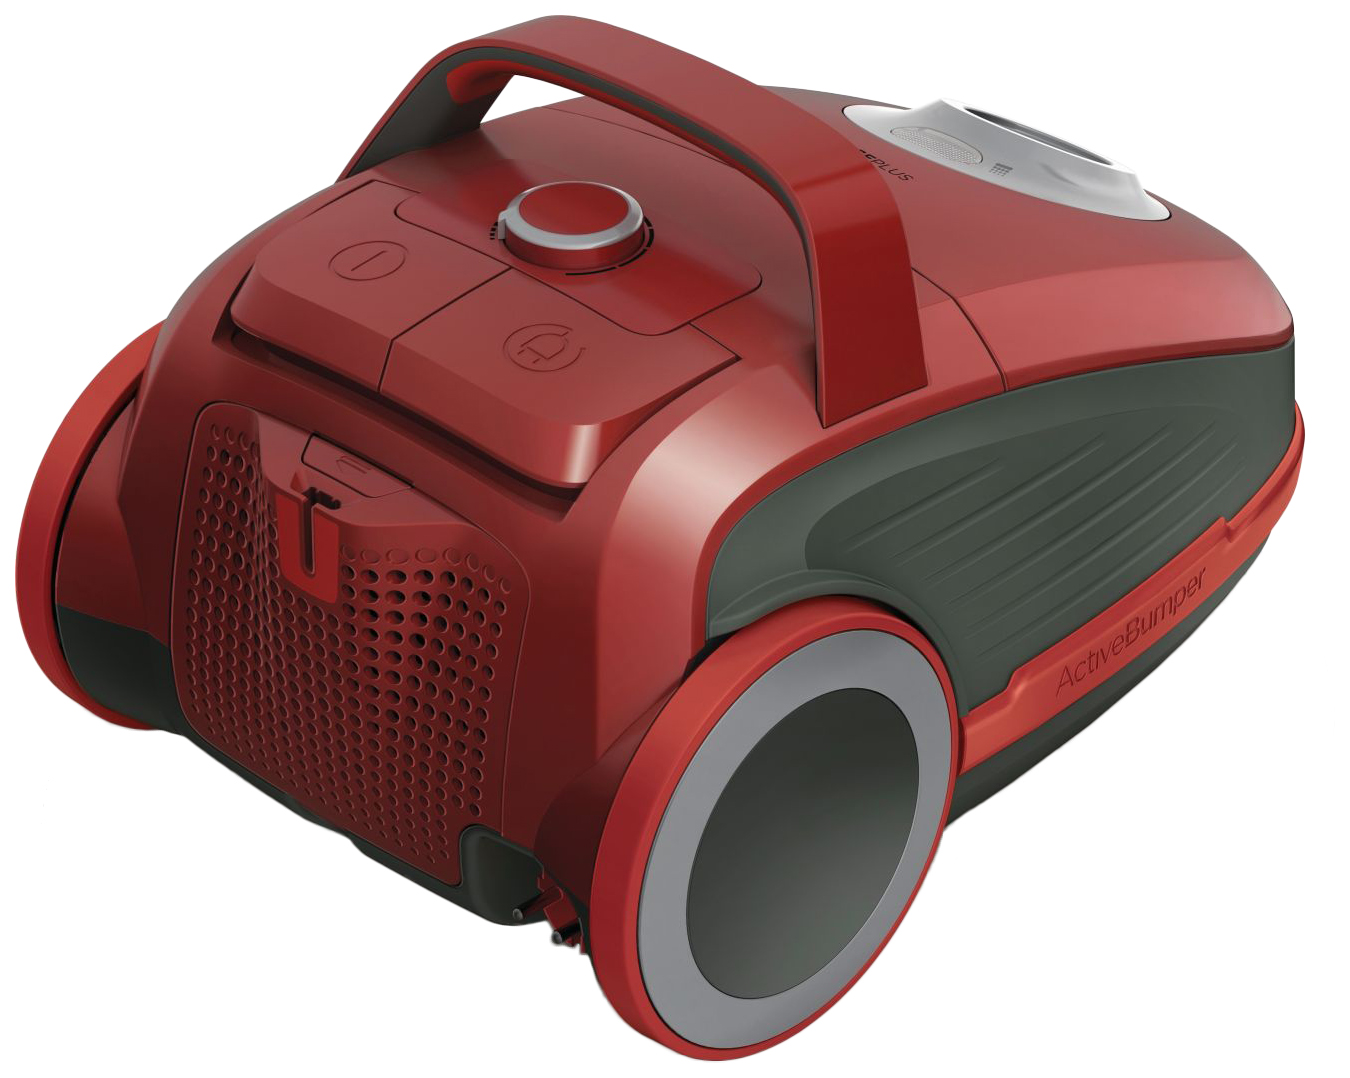 Пылесос Gorenje G Force Plus VC2321GPLRCY Red/Black